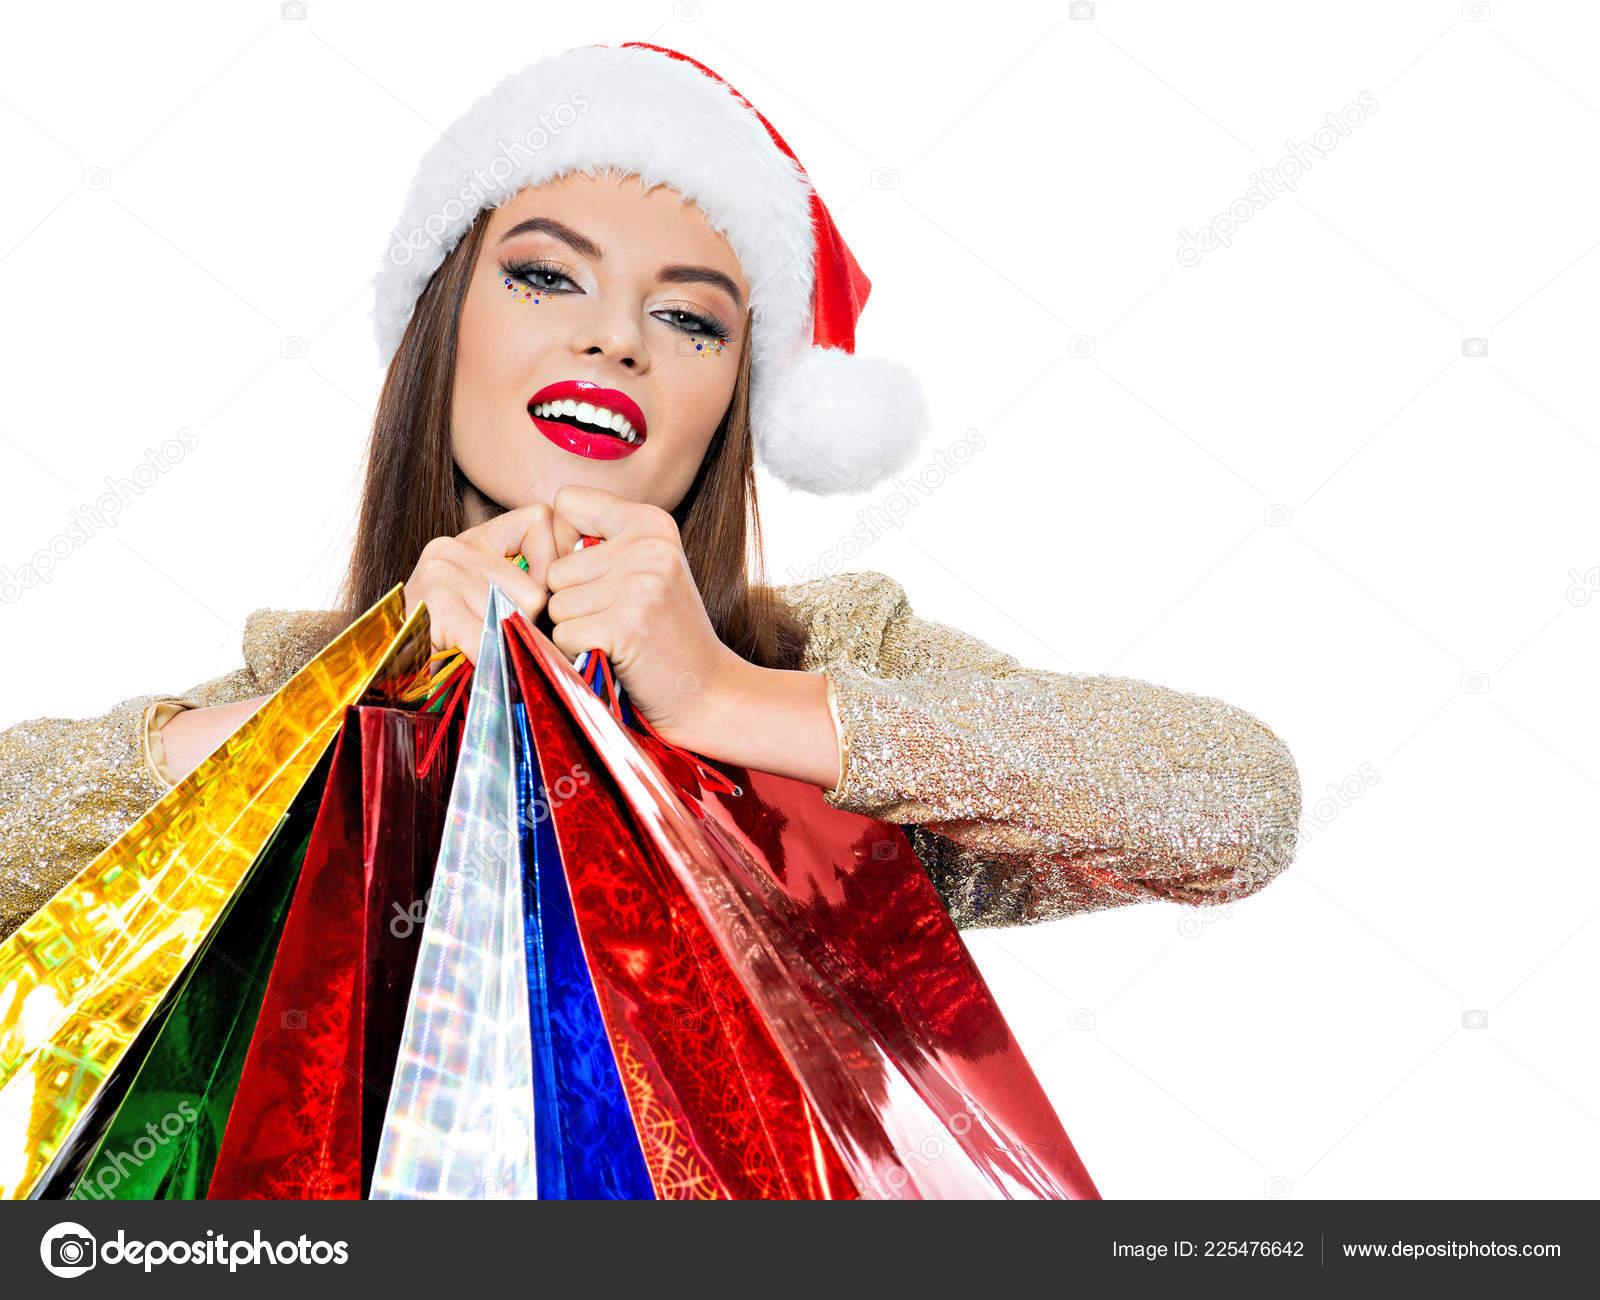 64da4c6048149 Woman Santa Hat Holding Colorful Shopping Bags Looking Away — Stock Photo